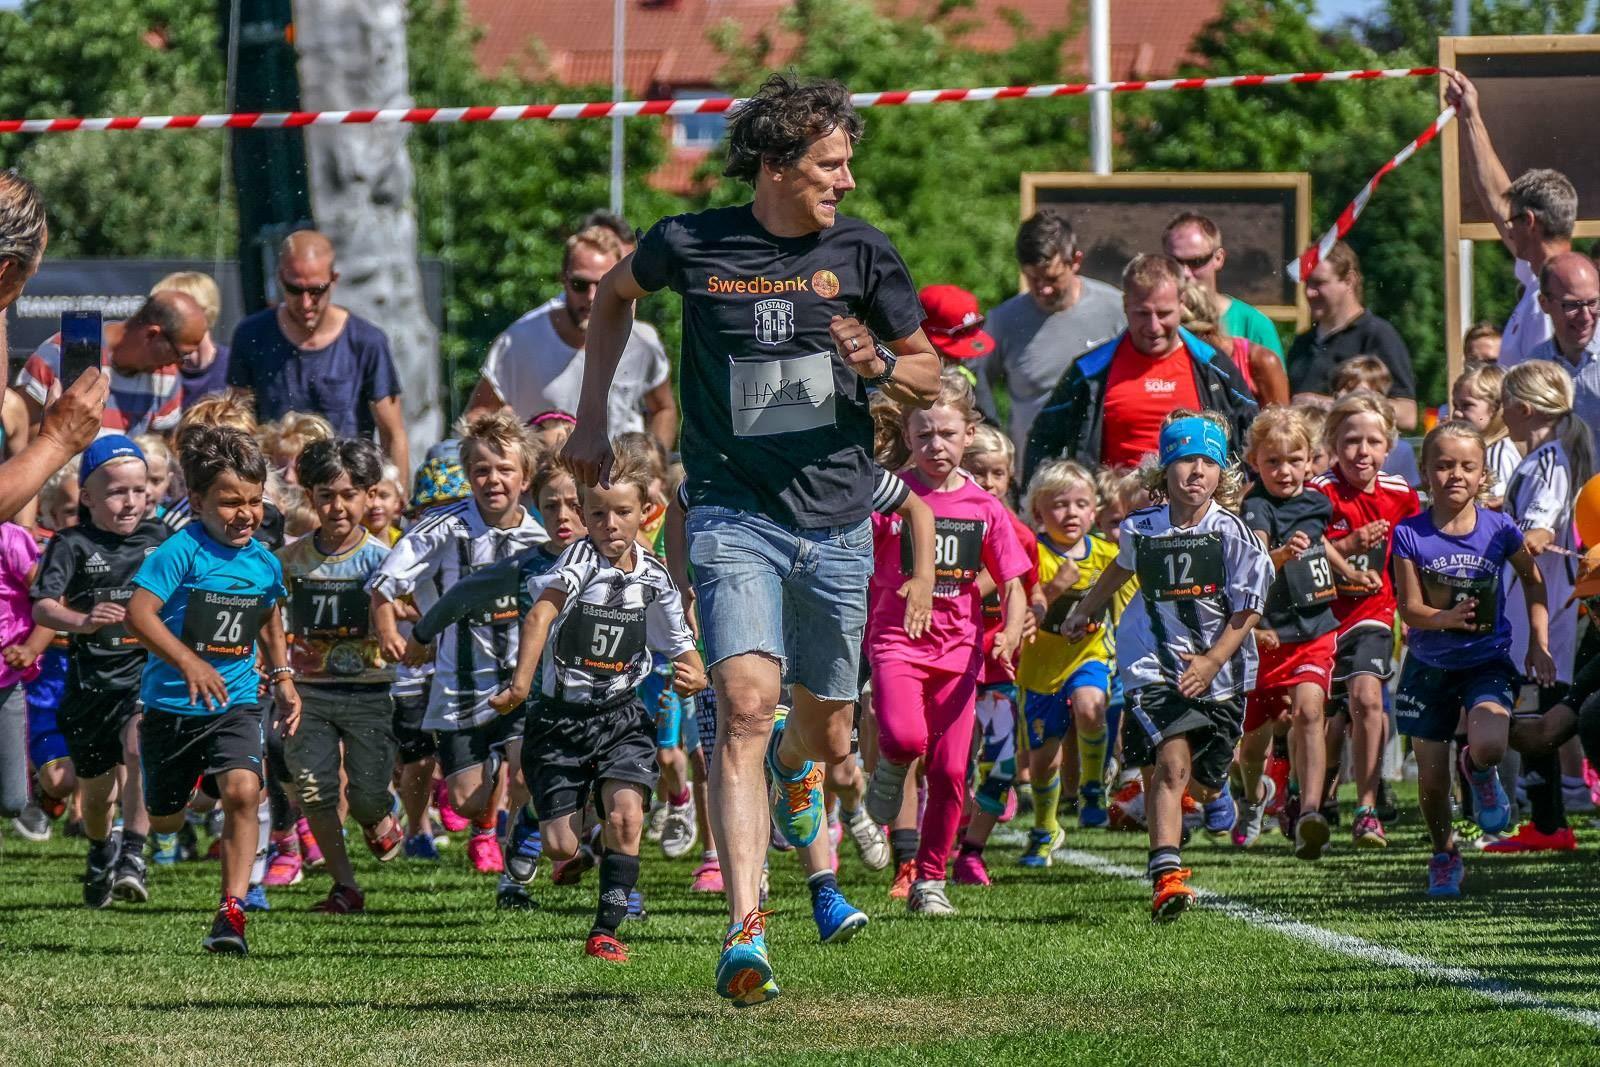 Båstad Sports Day and the Båstad Race